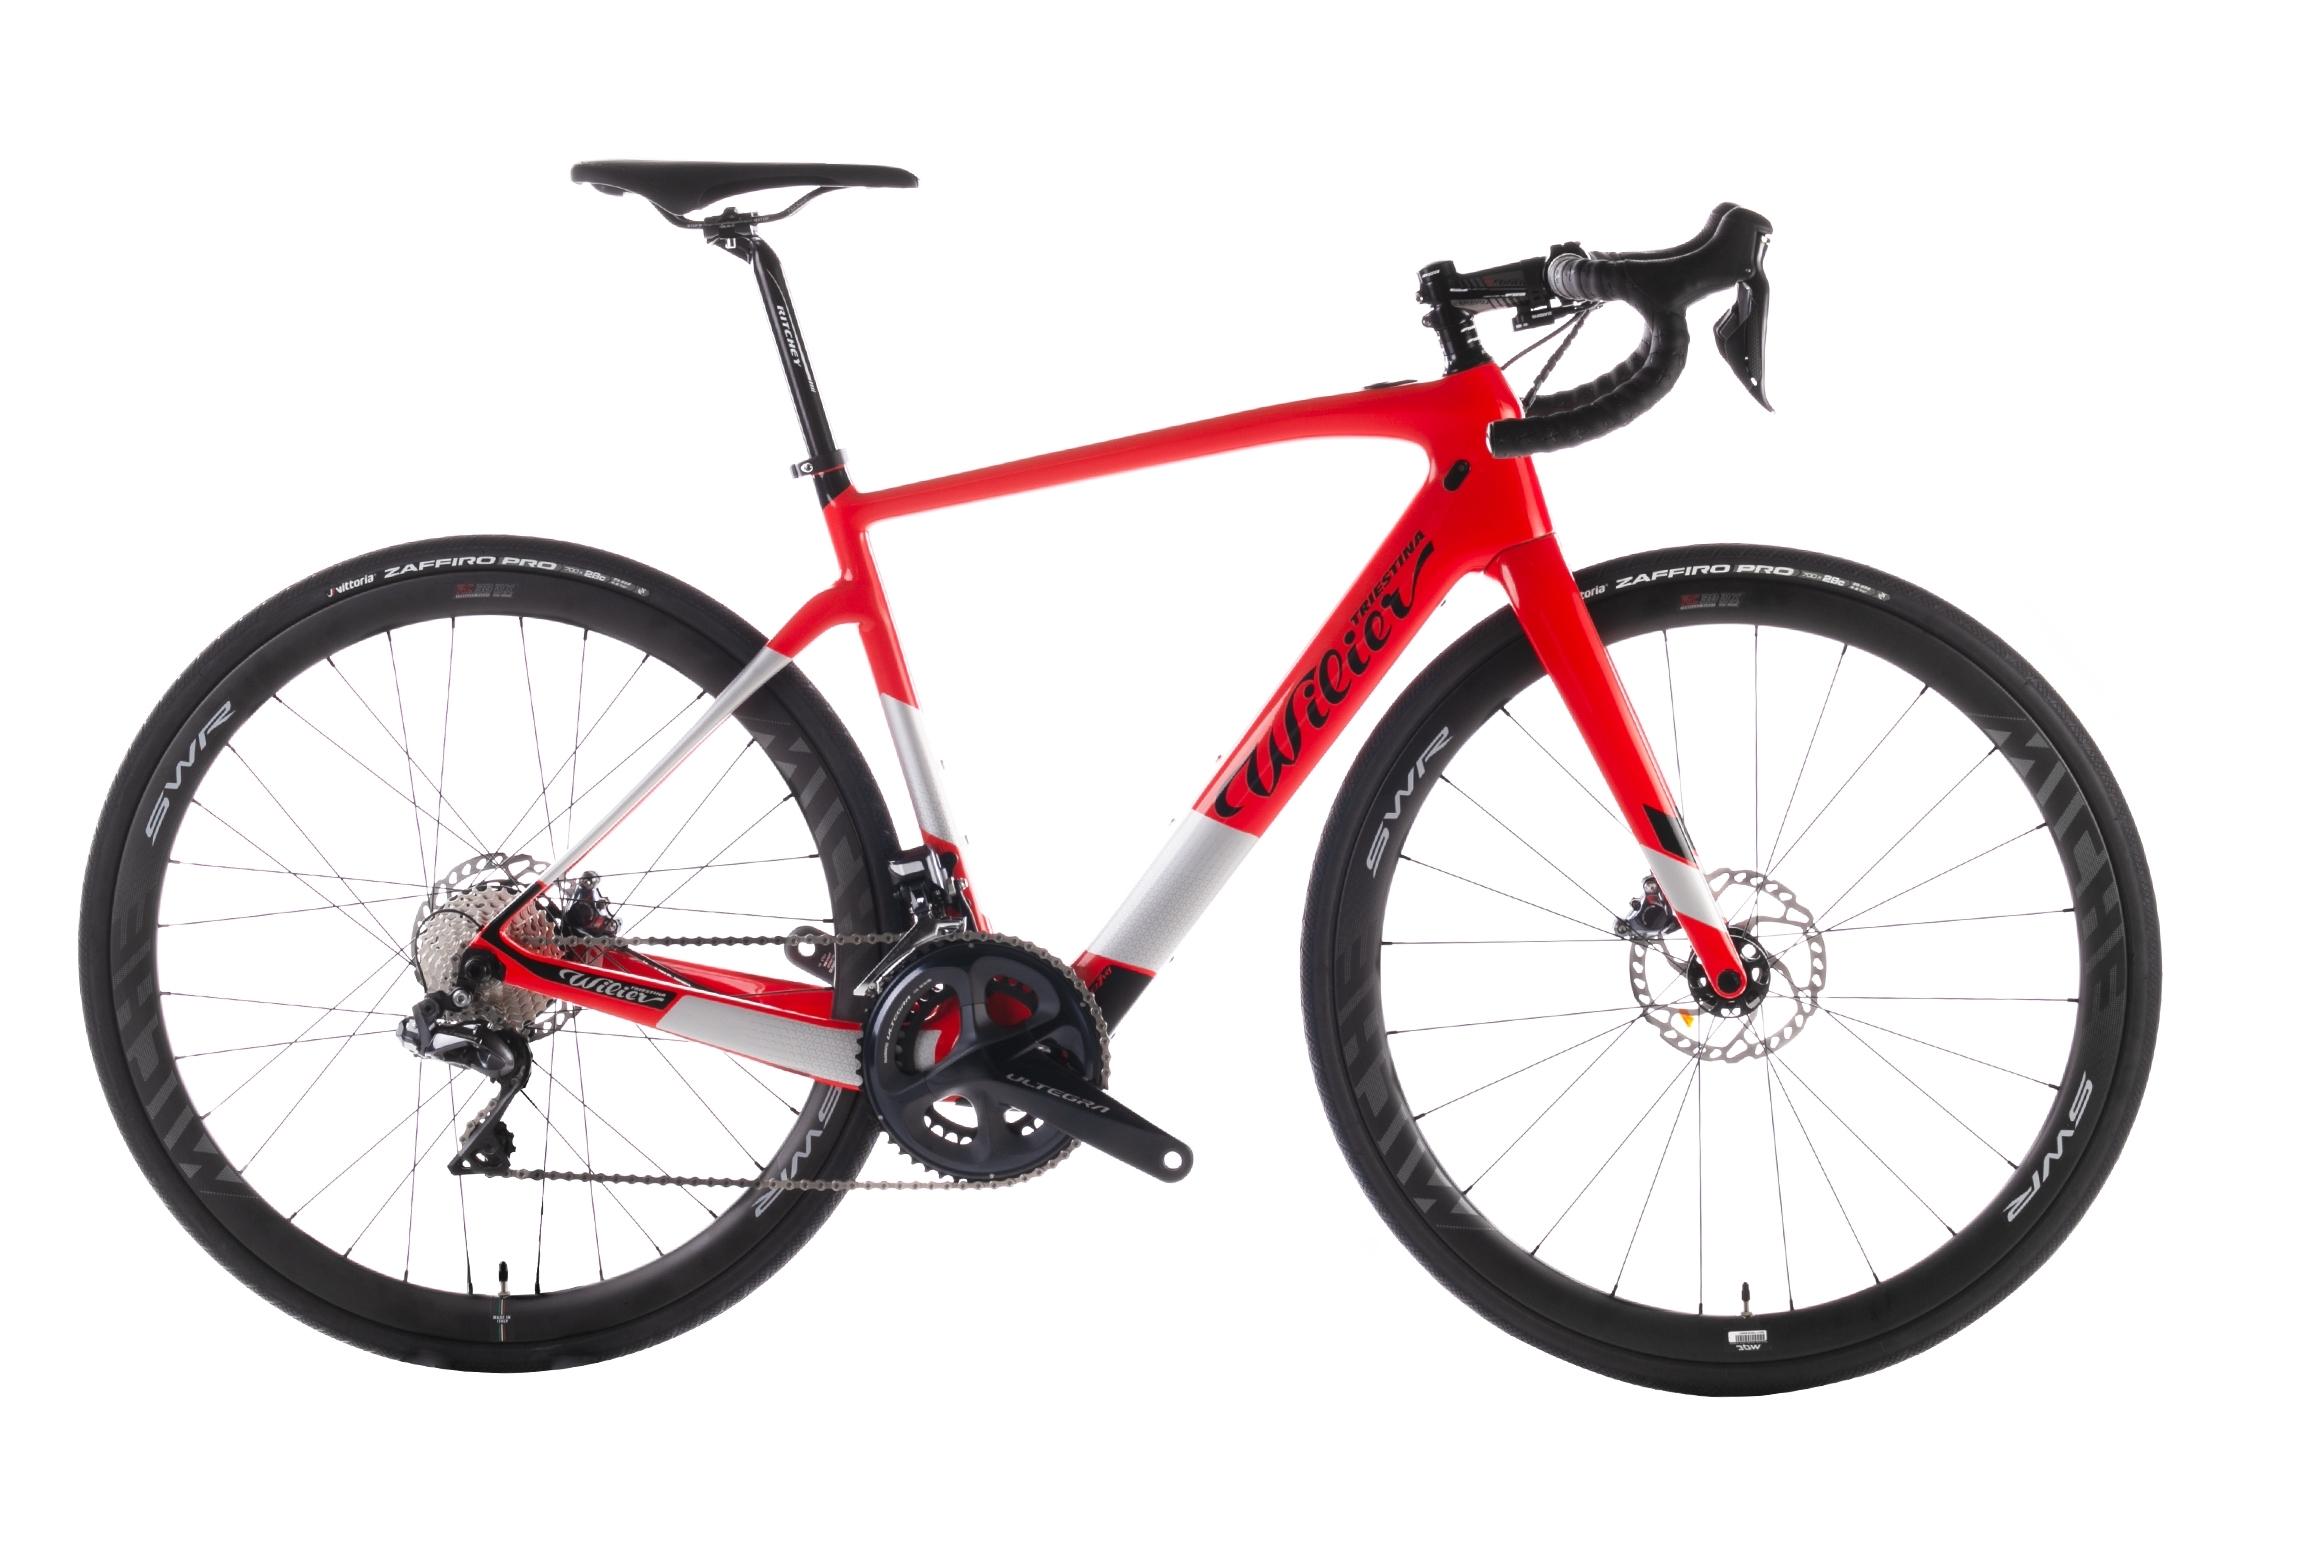 kolo CENTO1HY+ULTEGRA Di2 8070+REVOX red glossy  M